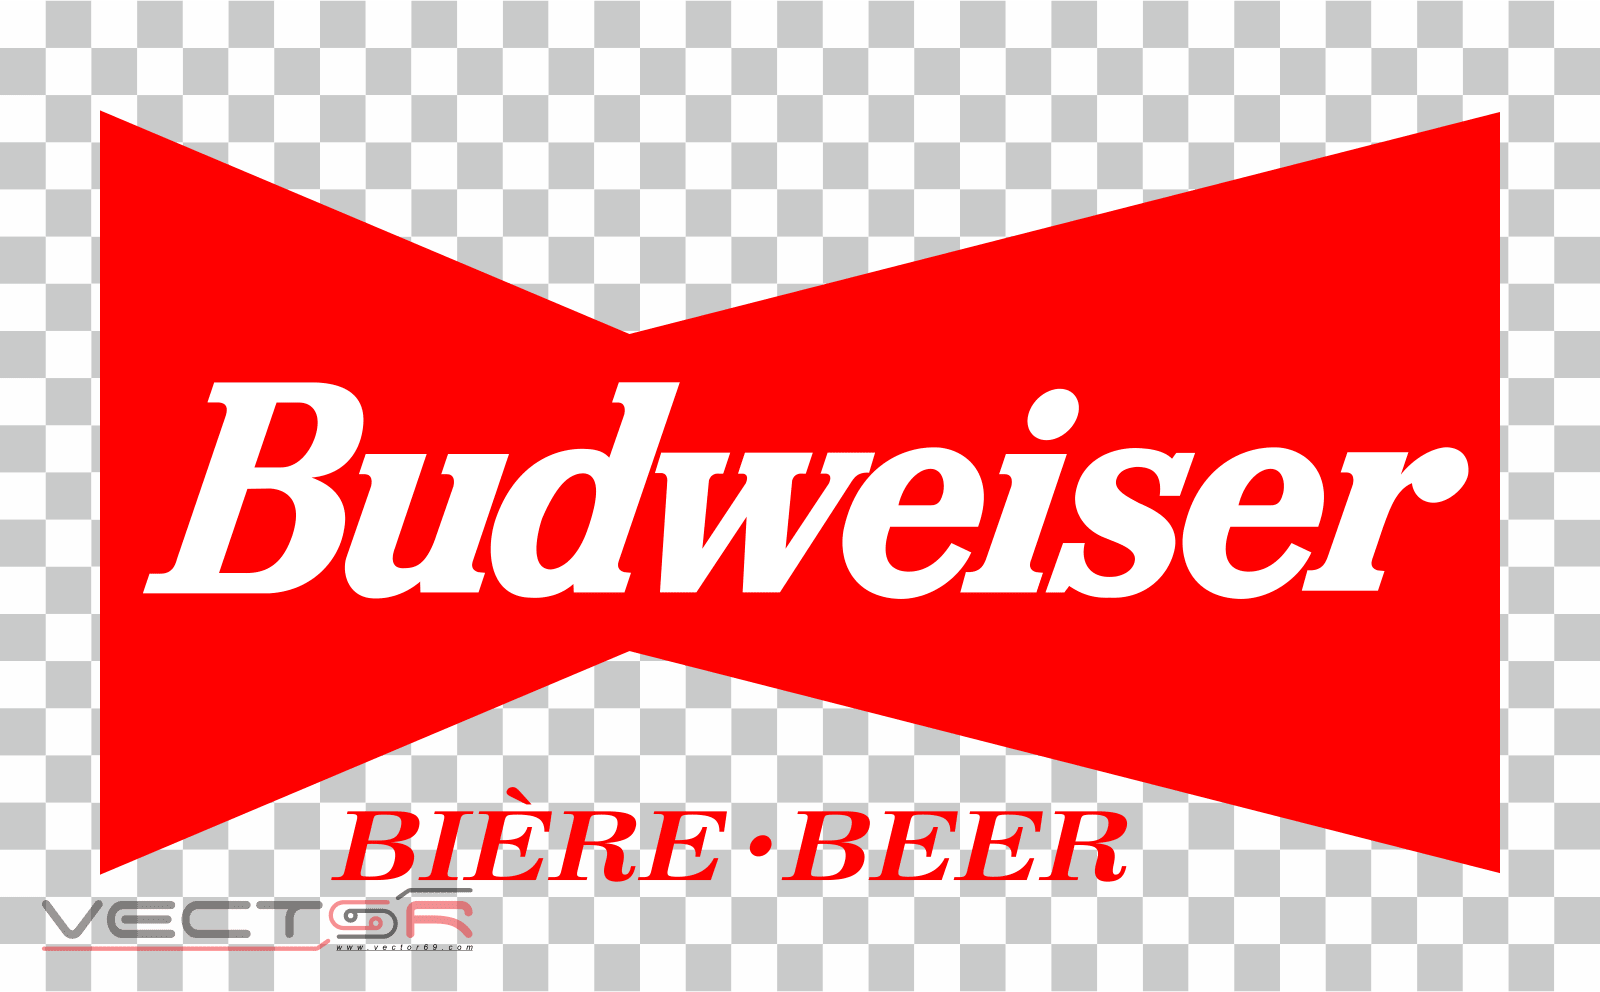 Budweiser (1994) Logo - Download .PNG (Portable Network Graphics) Transparent Images